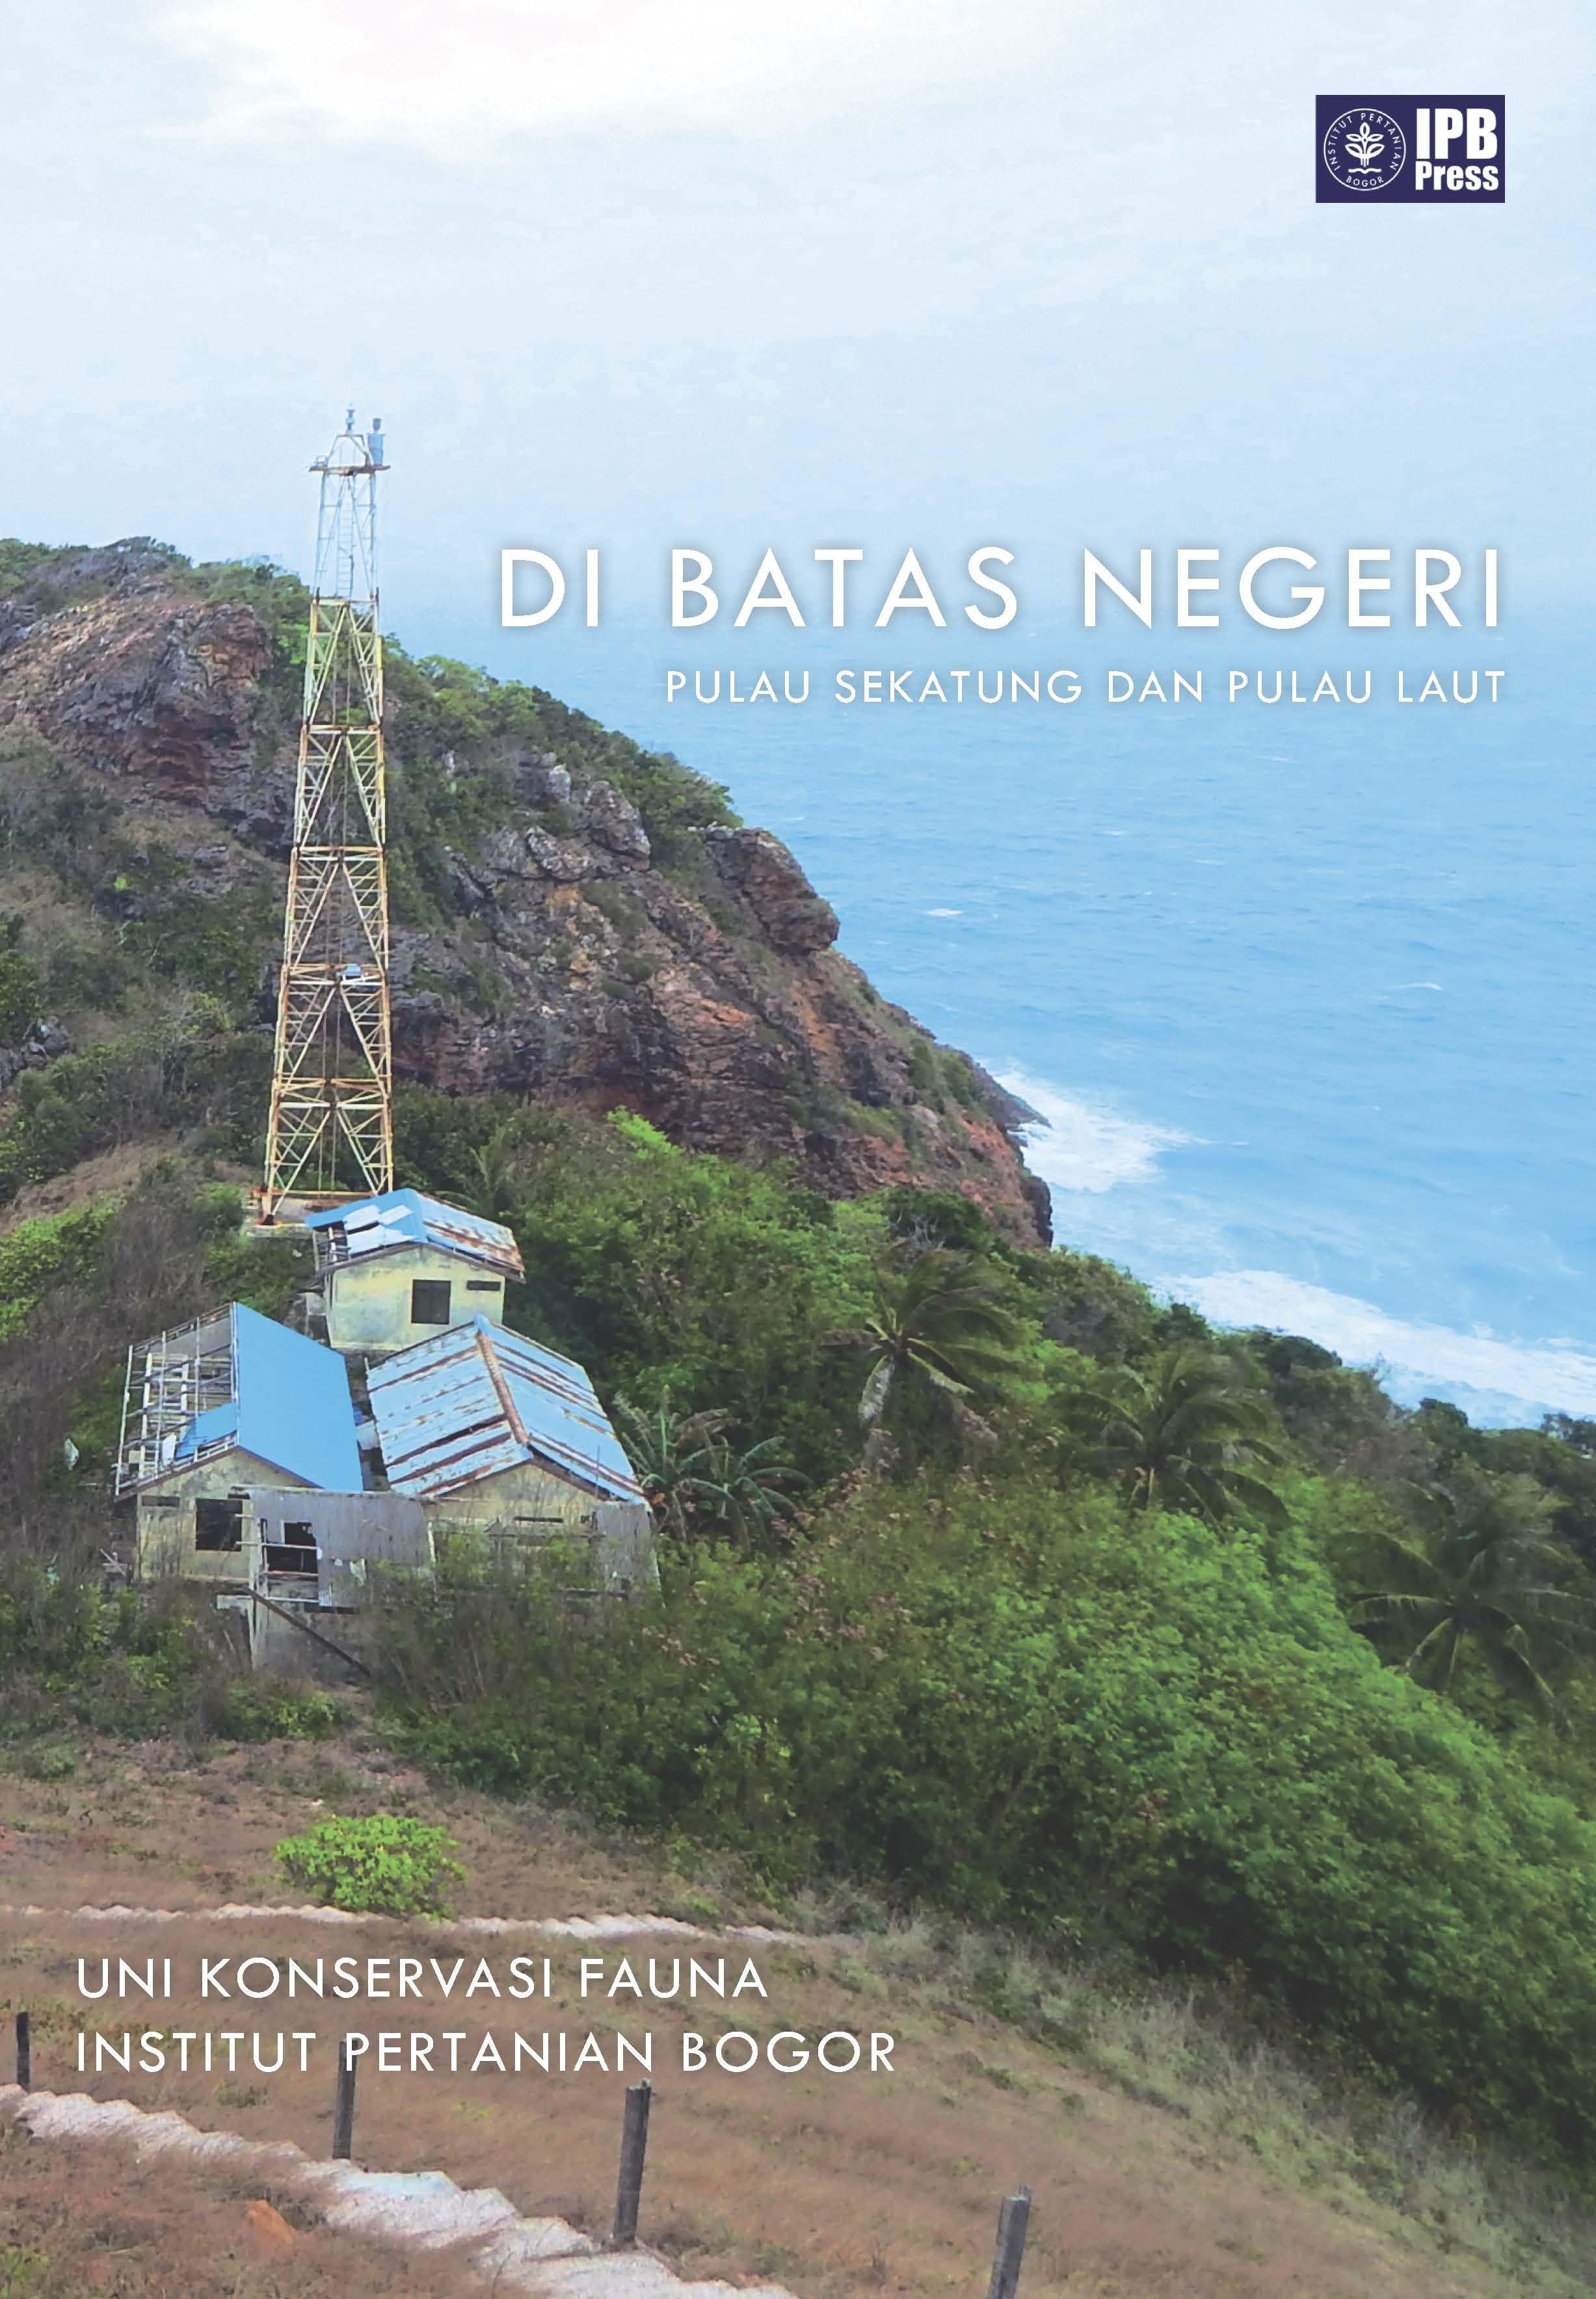 Di batas negeri [sumber elektronis] : pulau Sekatung dan pulau laut Natuna-kepulauan Riau